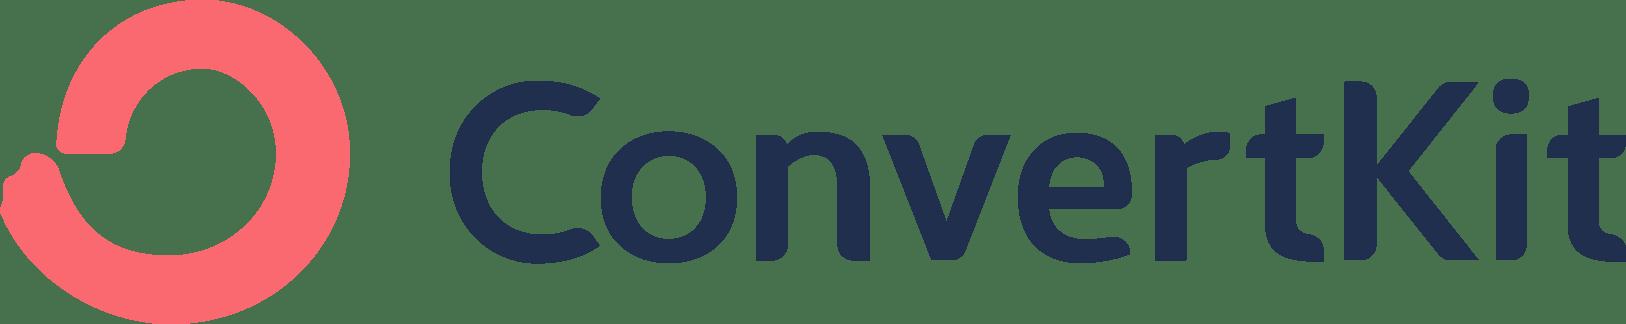 convertkit-long